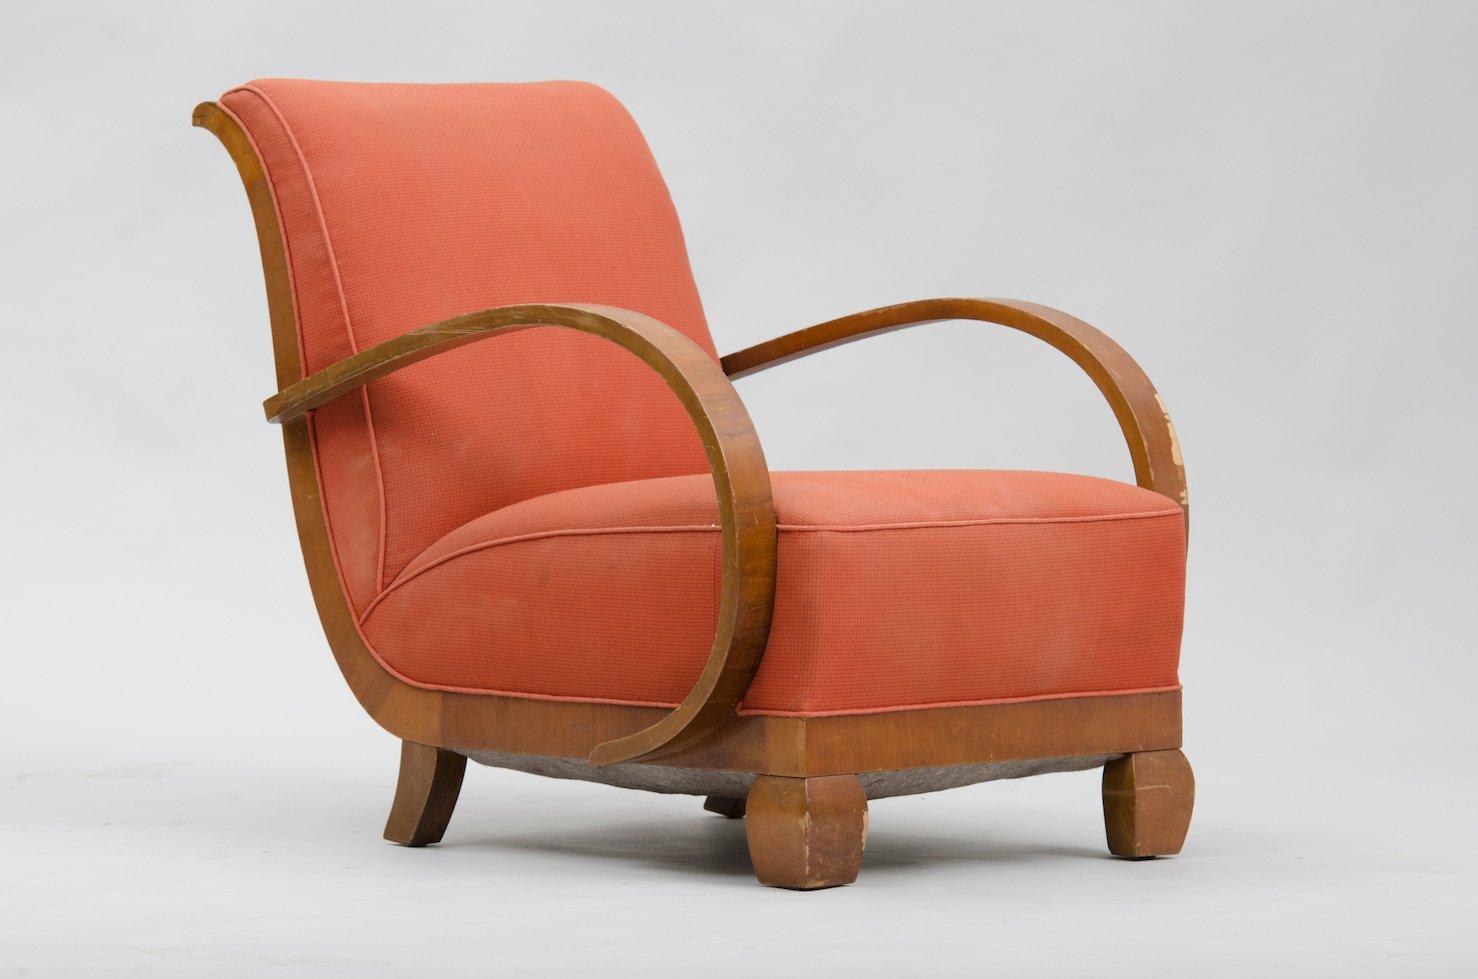 Artdeco Sessel deco sessel aus walnuss bei pamono kaufen